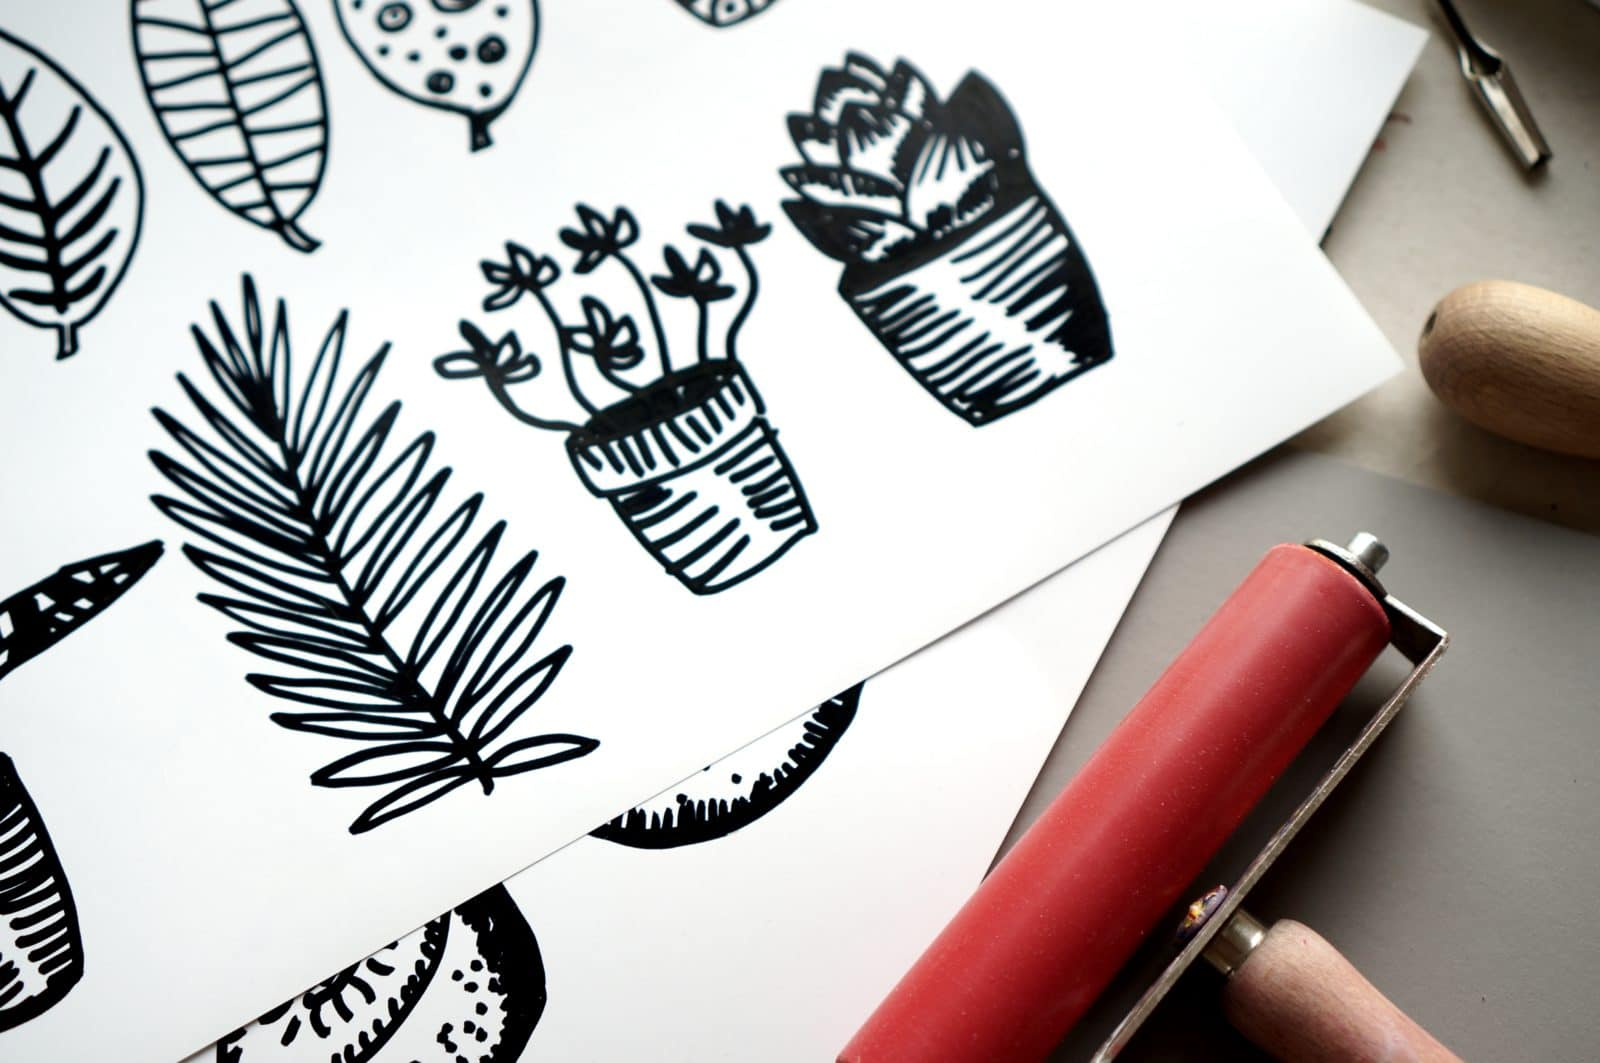 Grafik Druckgrafik Hochdruck Linolschnitt